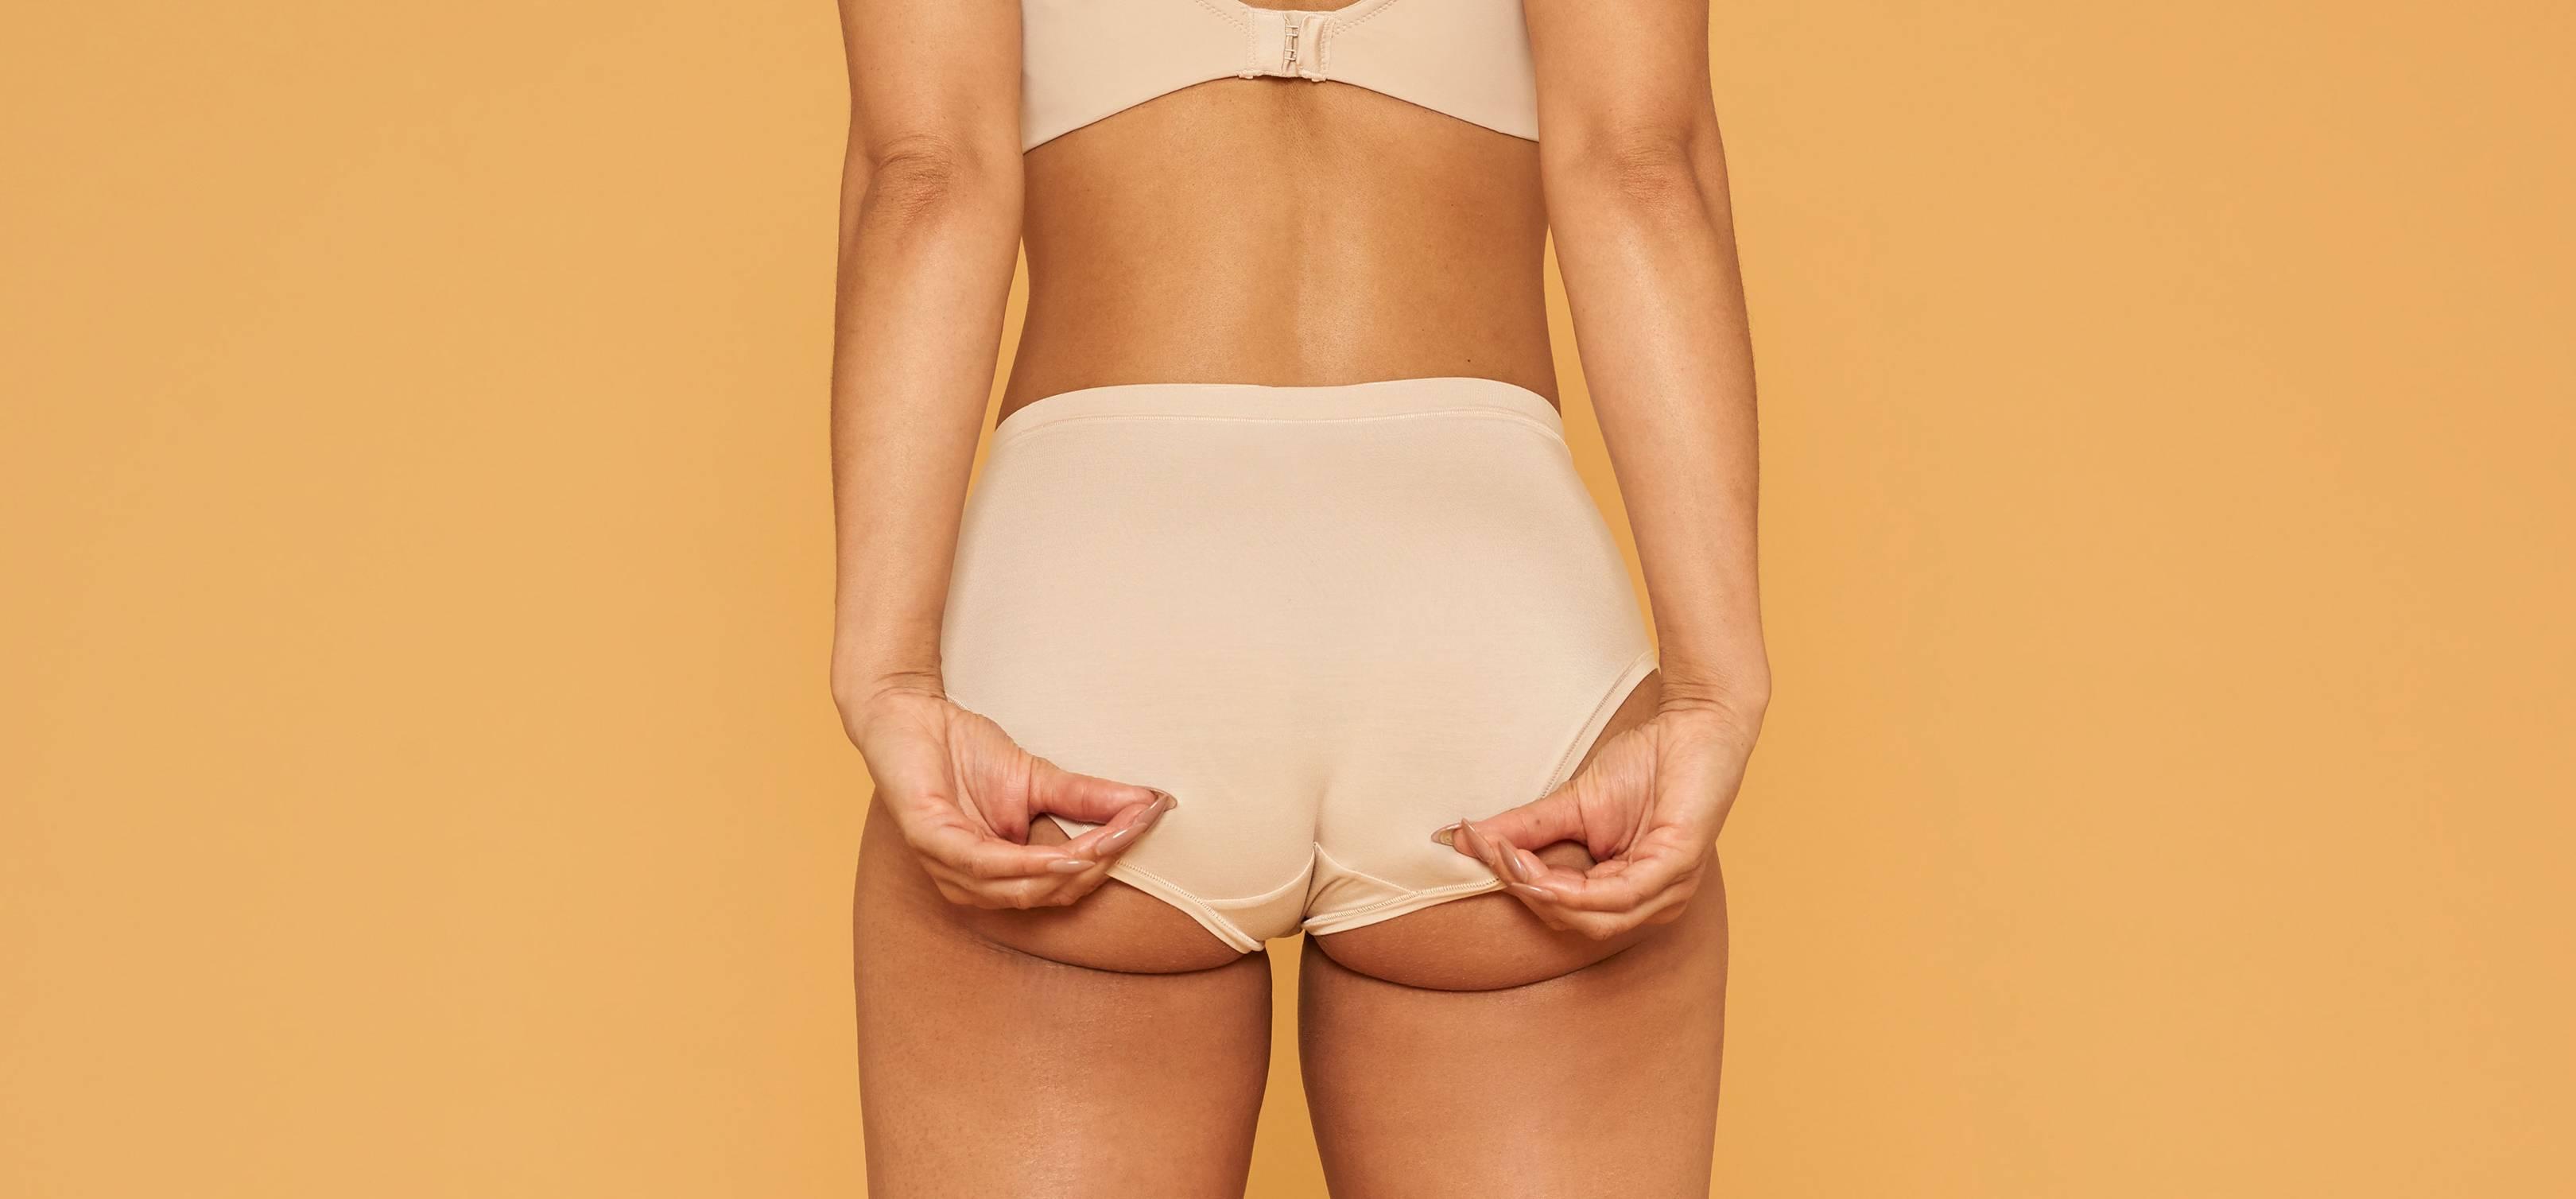 Women Who Love Panties Pics